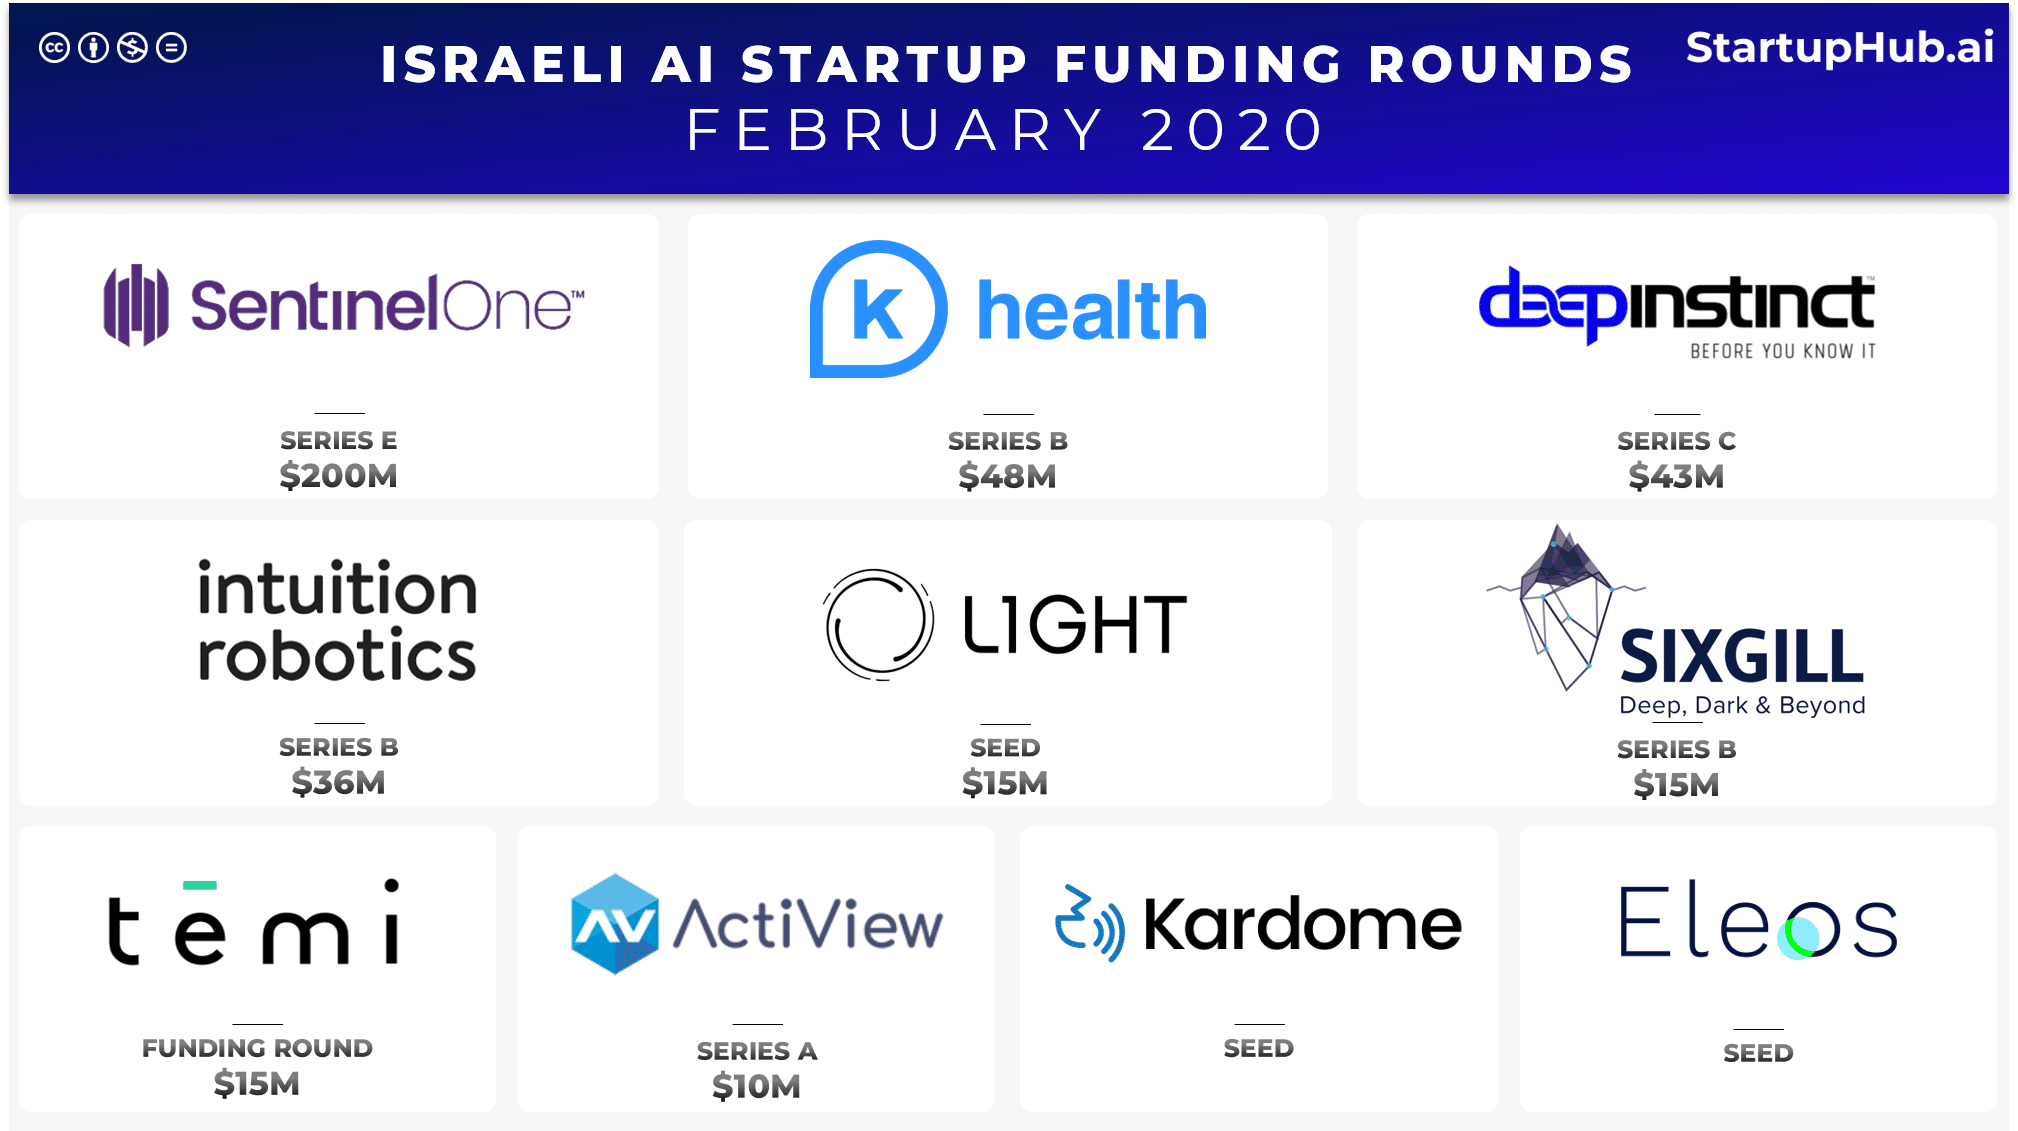 Israeli AI Startup Funding Rounds of February 2020